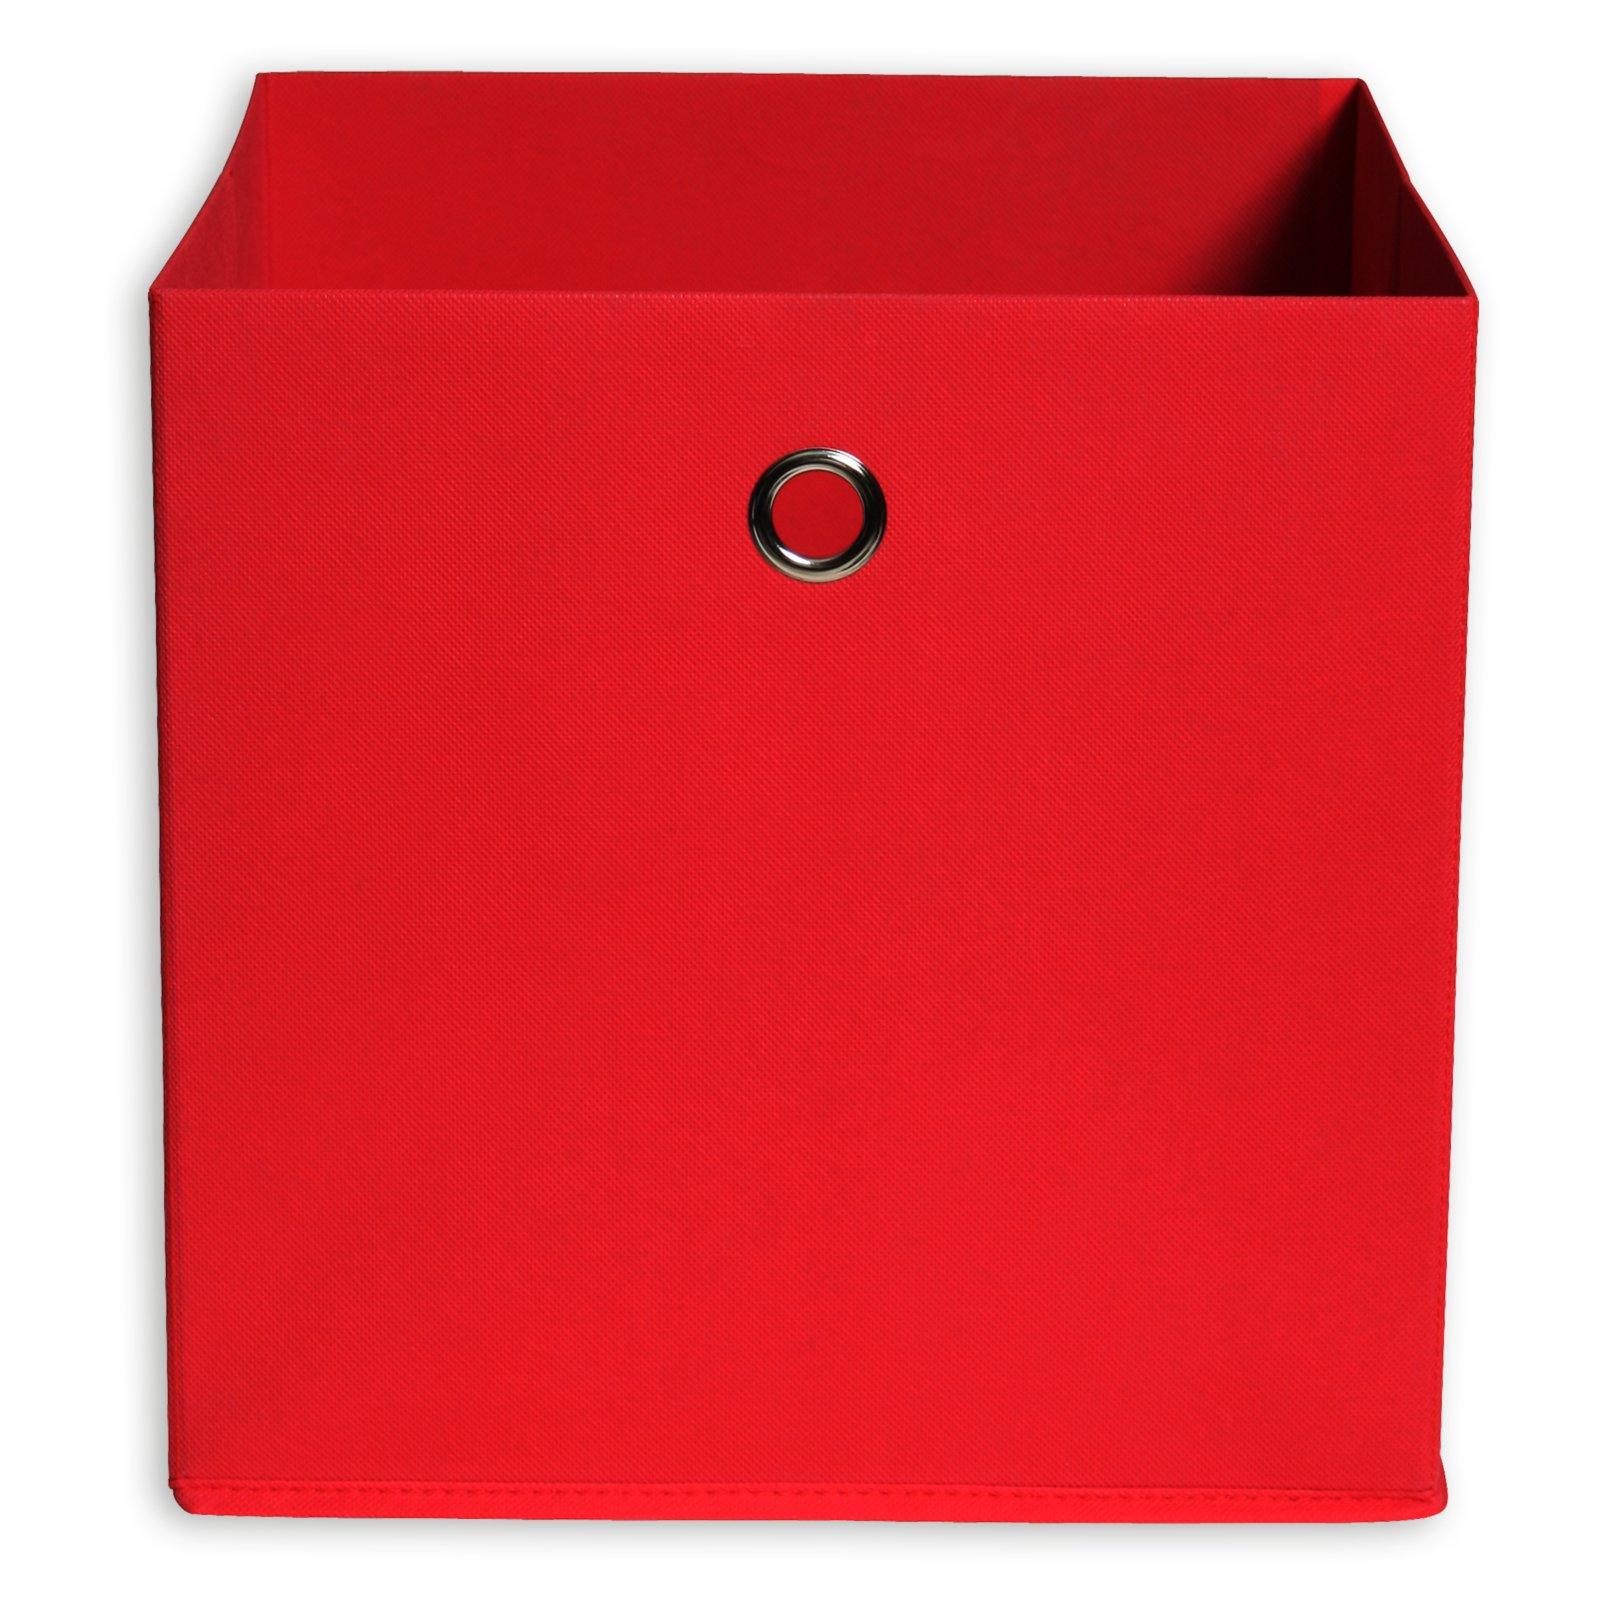 Faltbox - rot - mit Metallöse - 32x32 cm